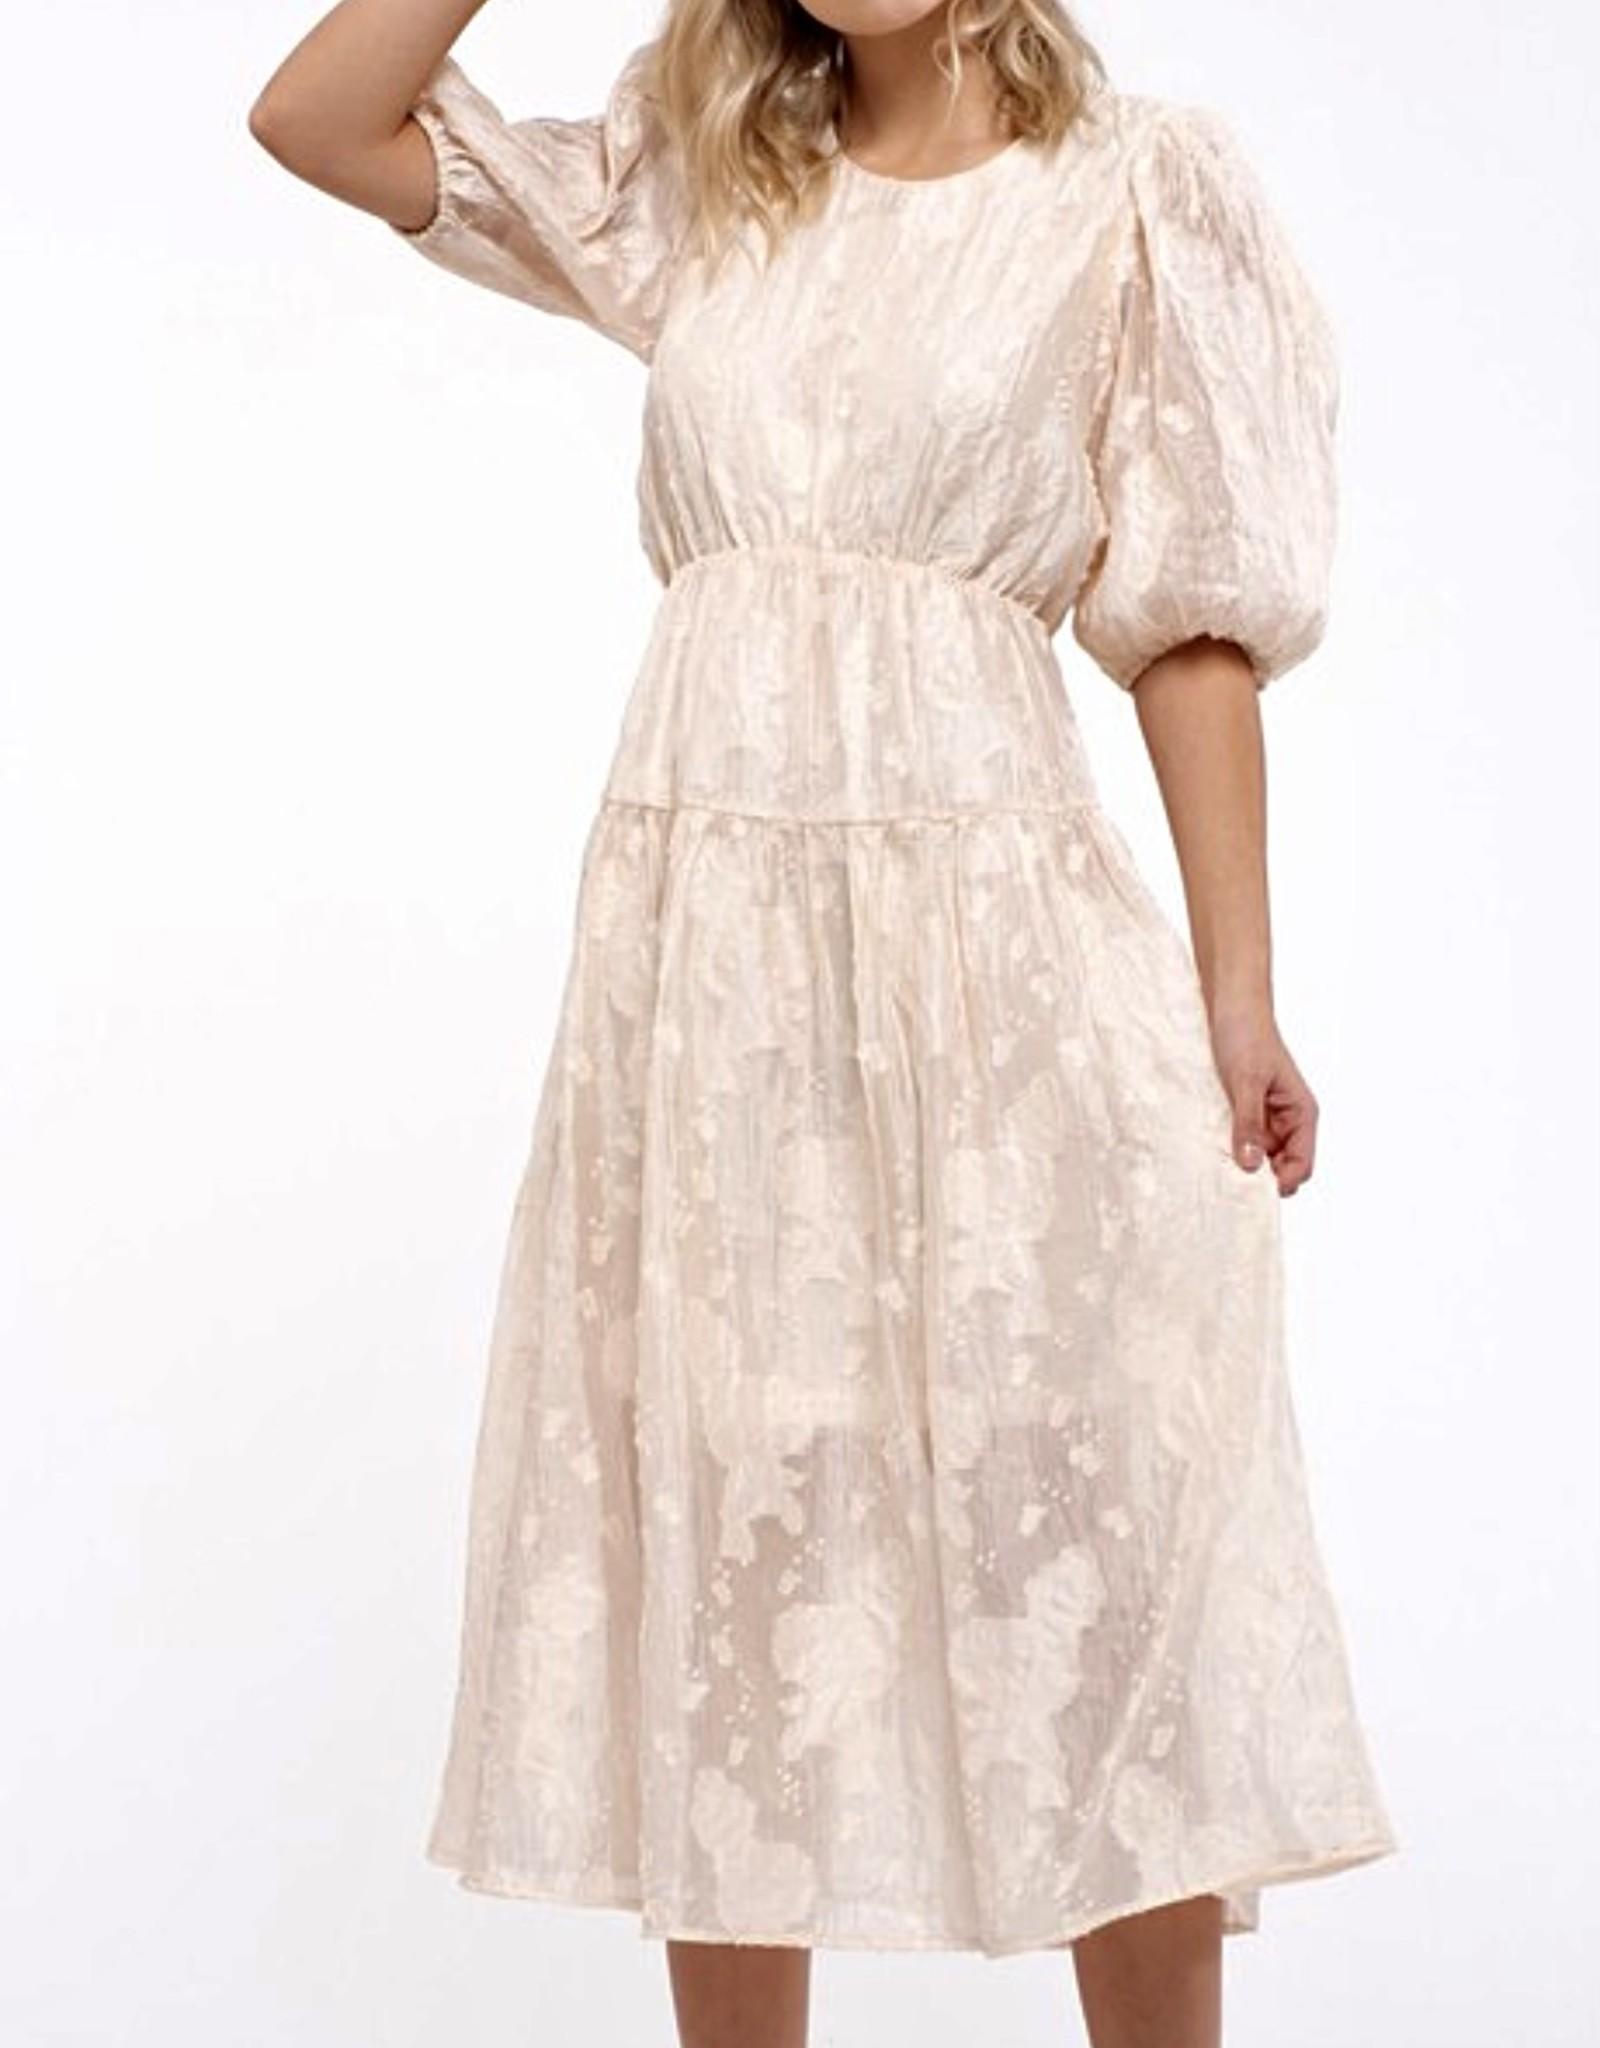 HUSH Textured fabric 3/4 sleeve midi dress